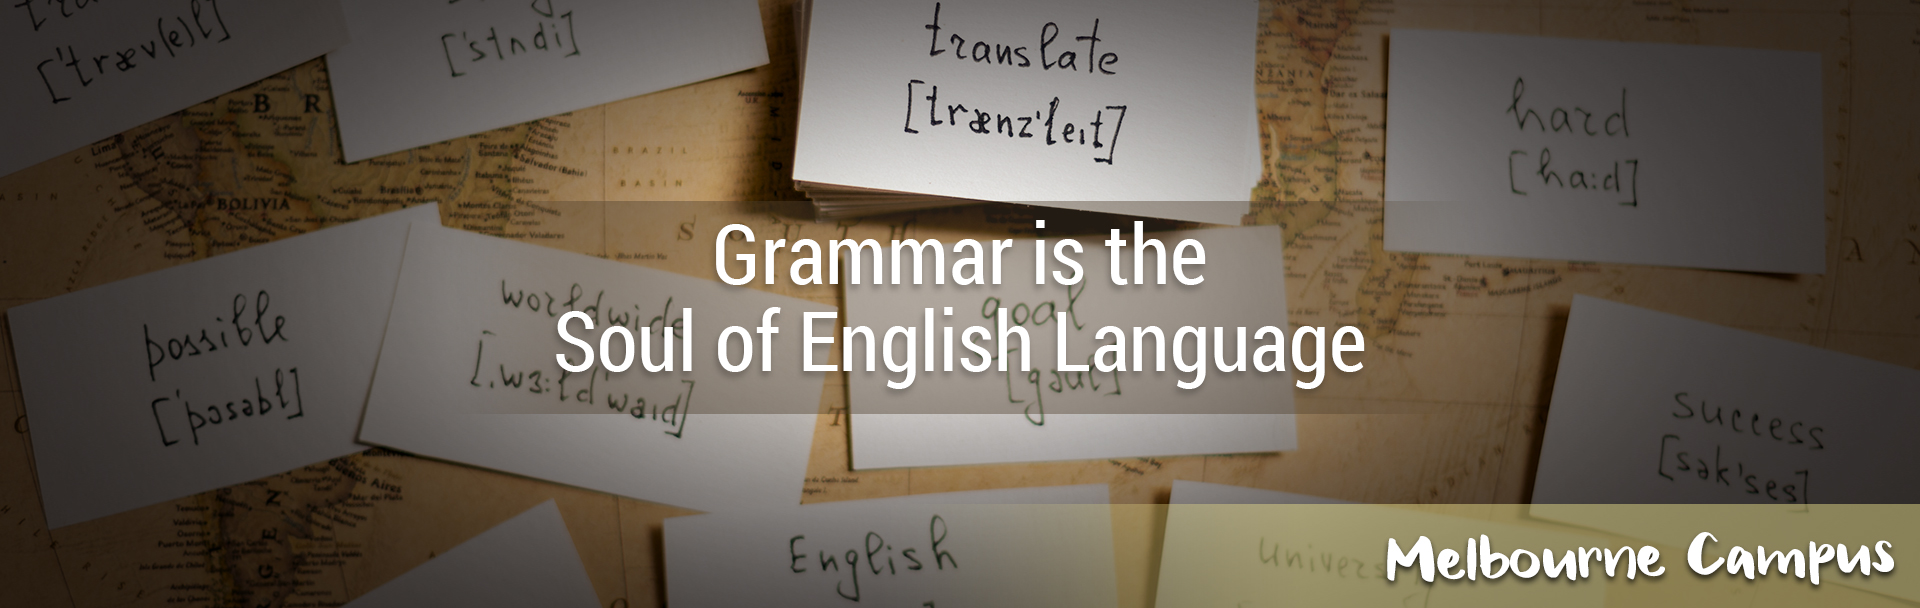 Grammar is the Soul English Language